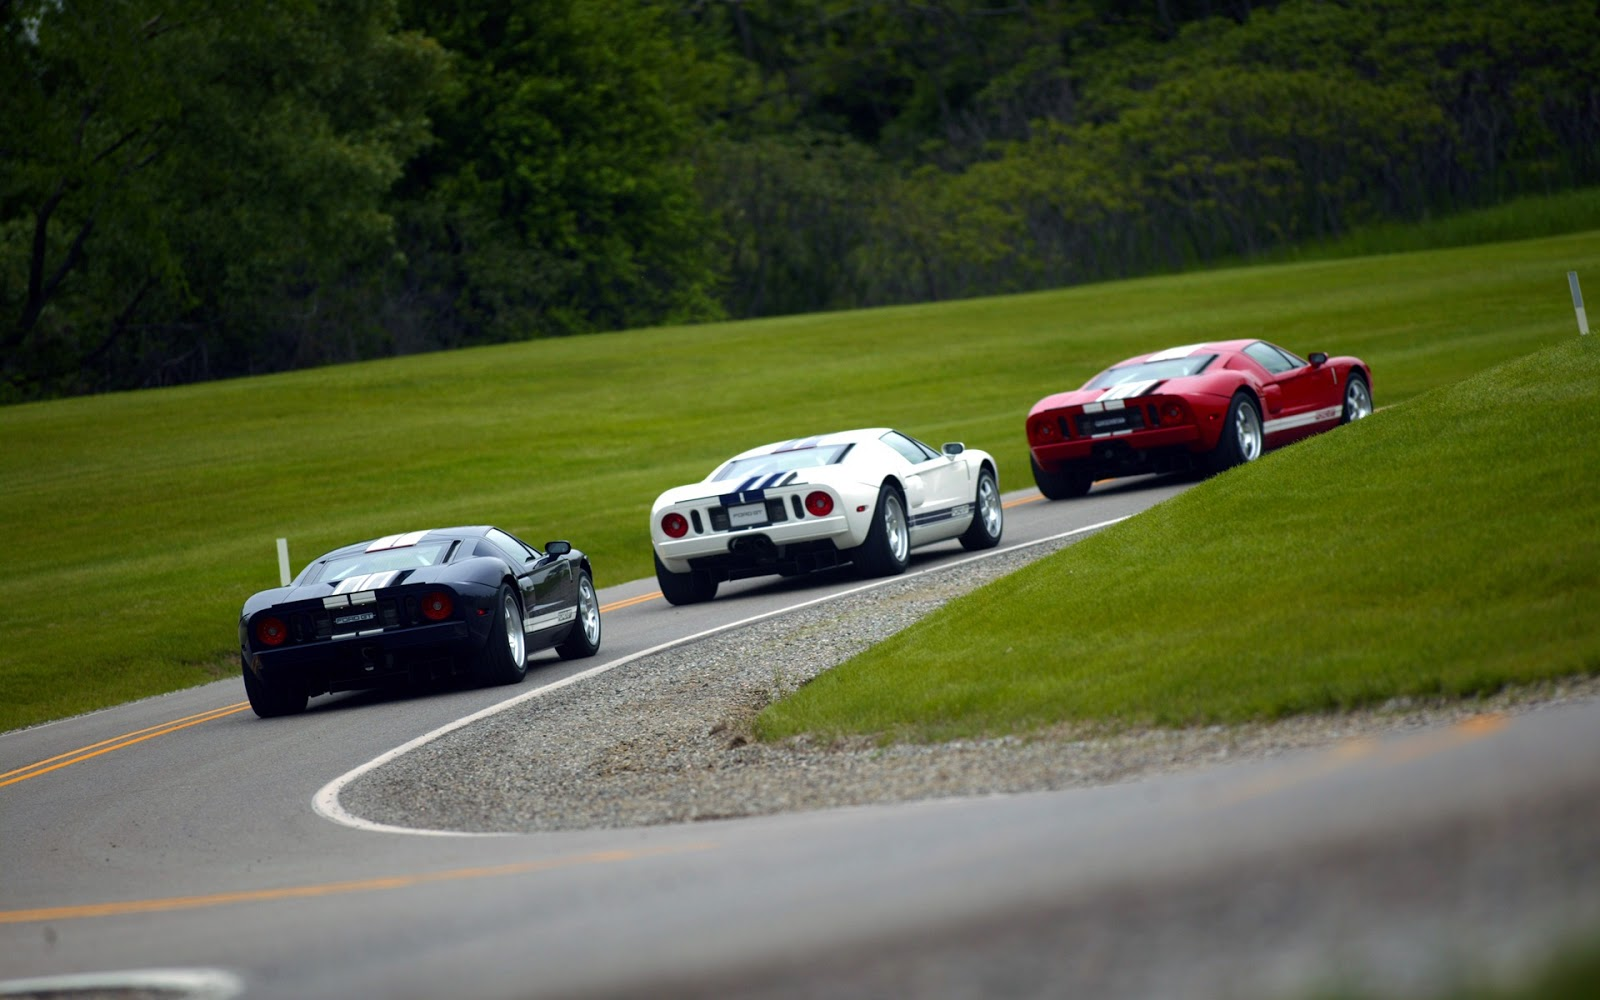 http://3.bp.blogspot.com/-yAhuvN6j8DU/UZmXAJ-taUI/AAAAAAAAN70/_mNBhrPihi0/s1600/Mega-Cars-2011-Models-HD-Wallpapers-26.jpg